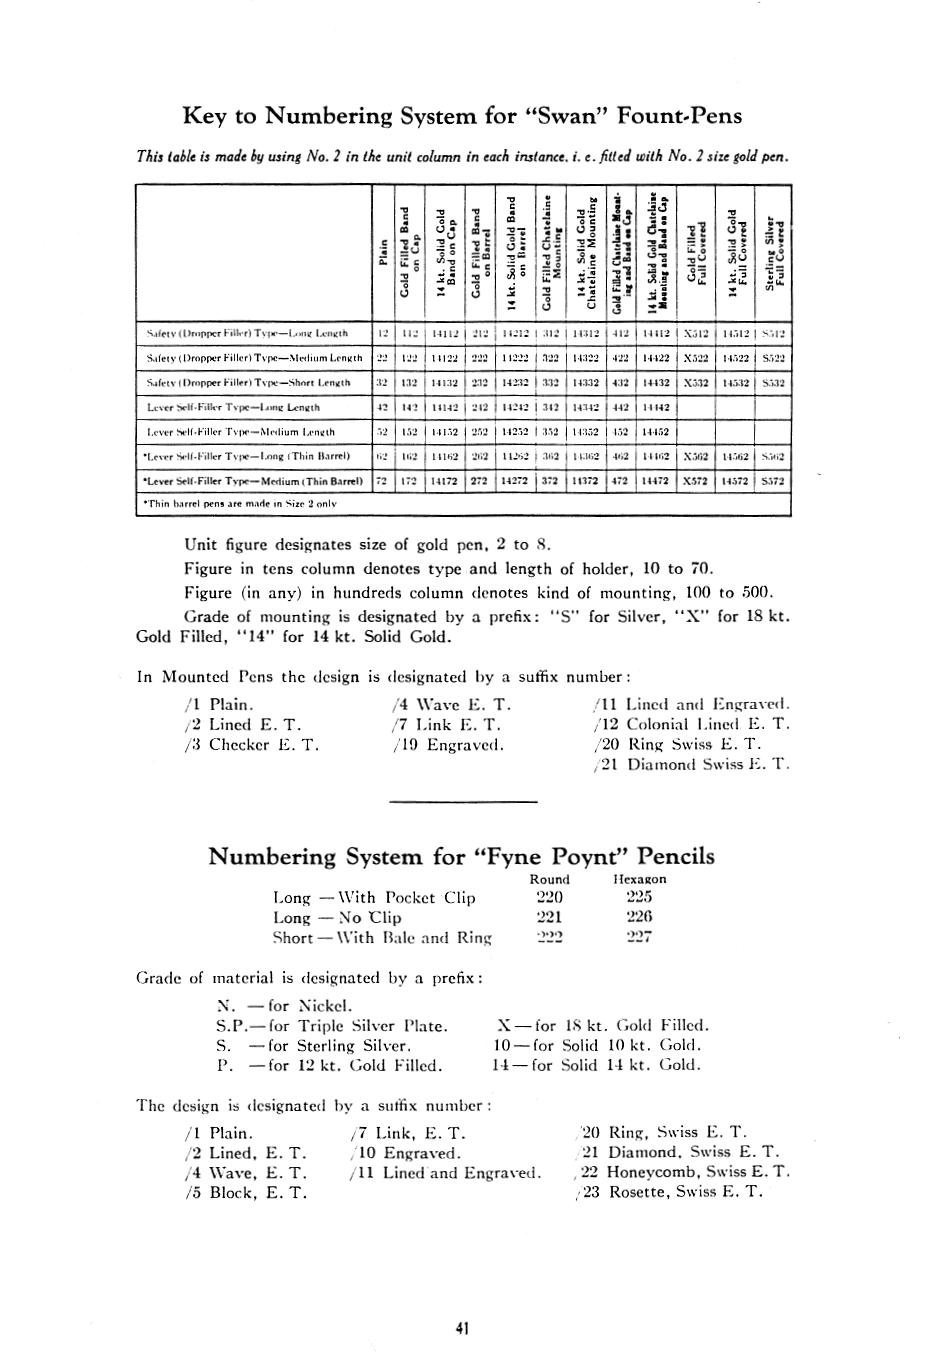 mabie_todd_catalog_1921.png